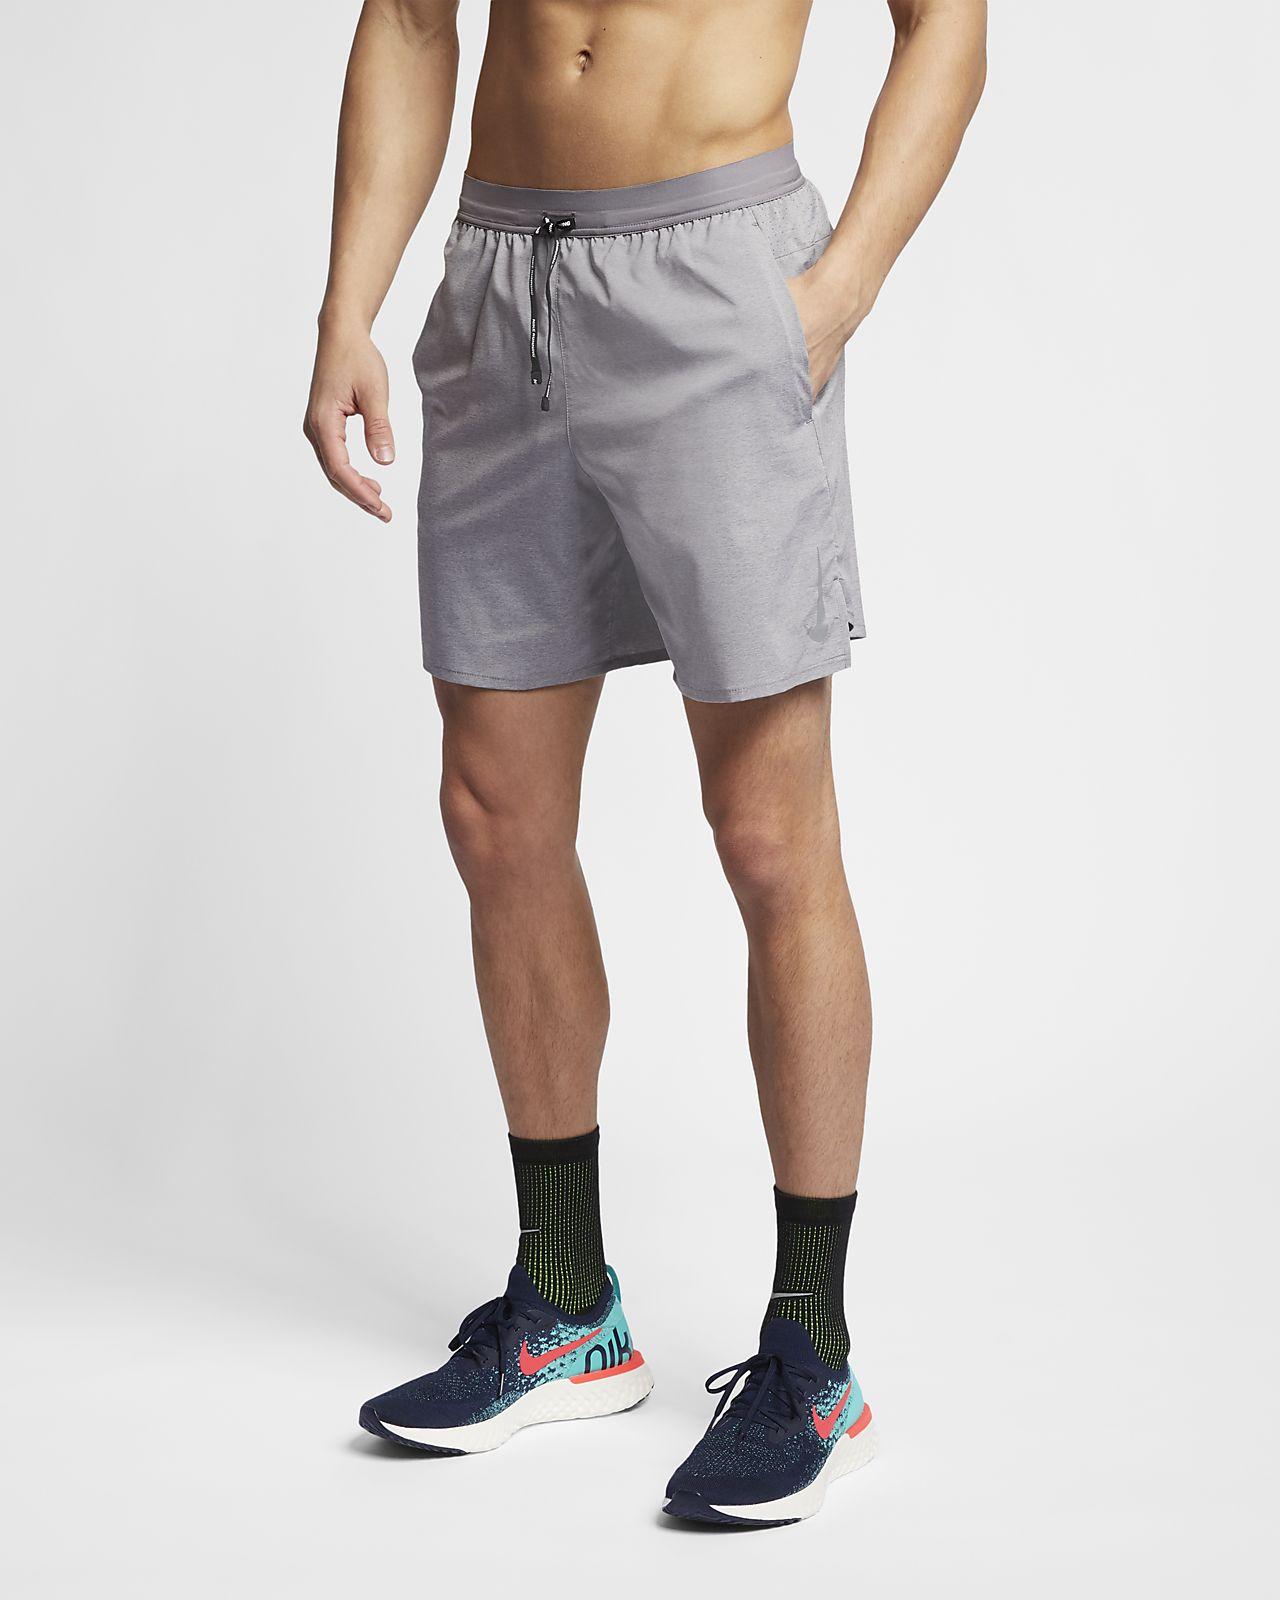 Nike Dri-FIT Flex Stride Pantalons curts 2 en 1 de 18 cm de running - Home